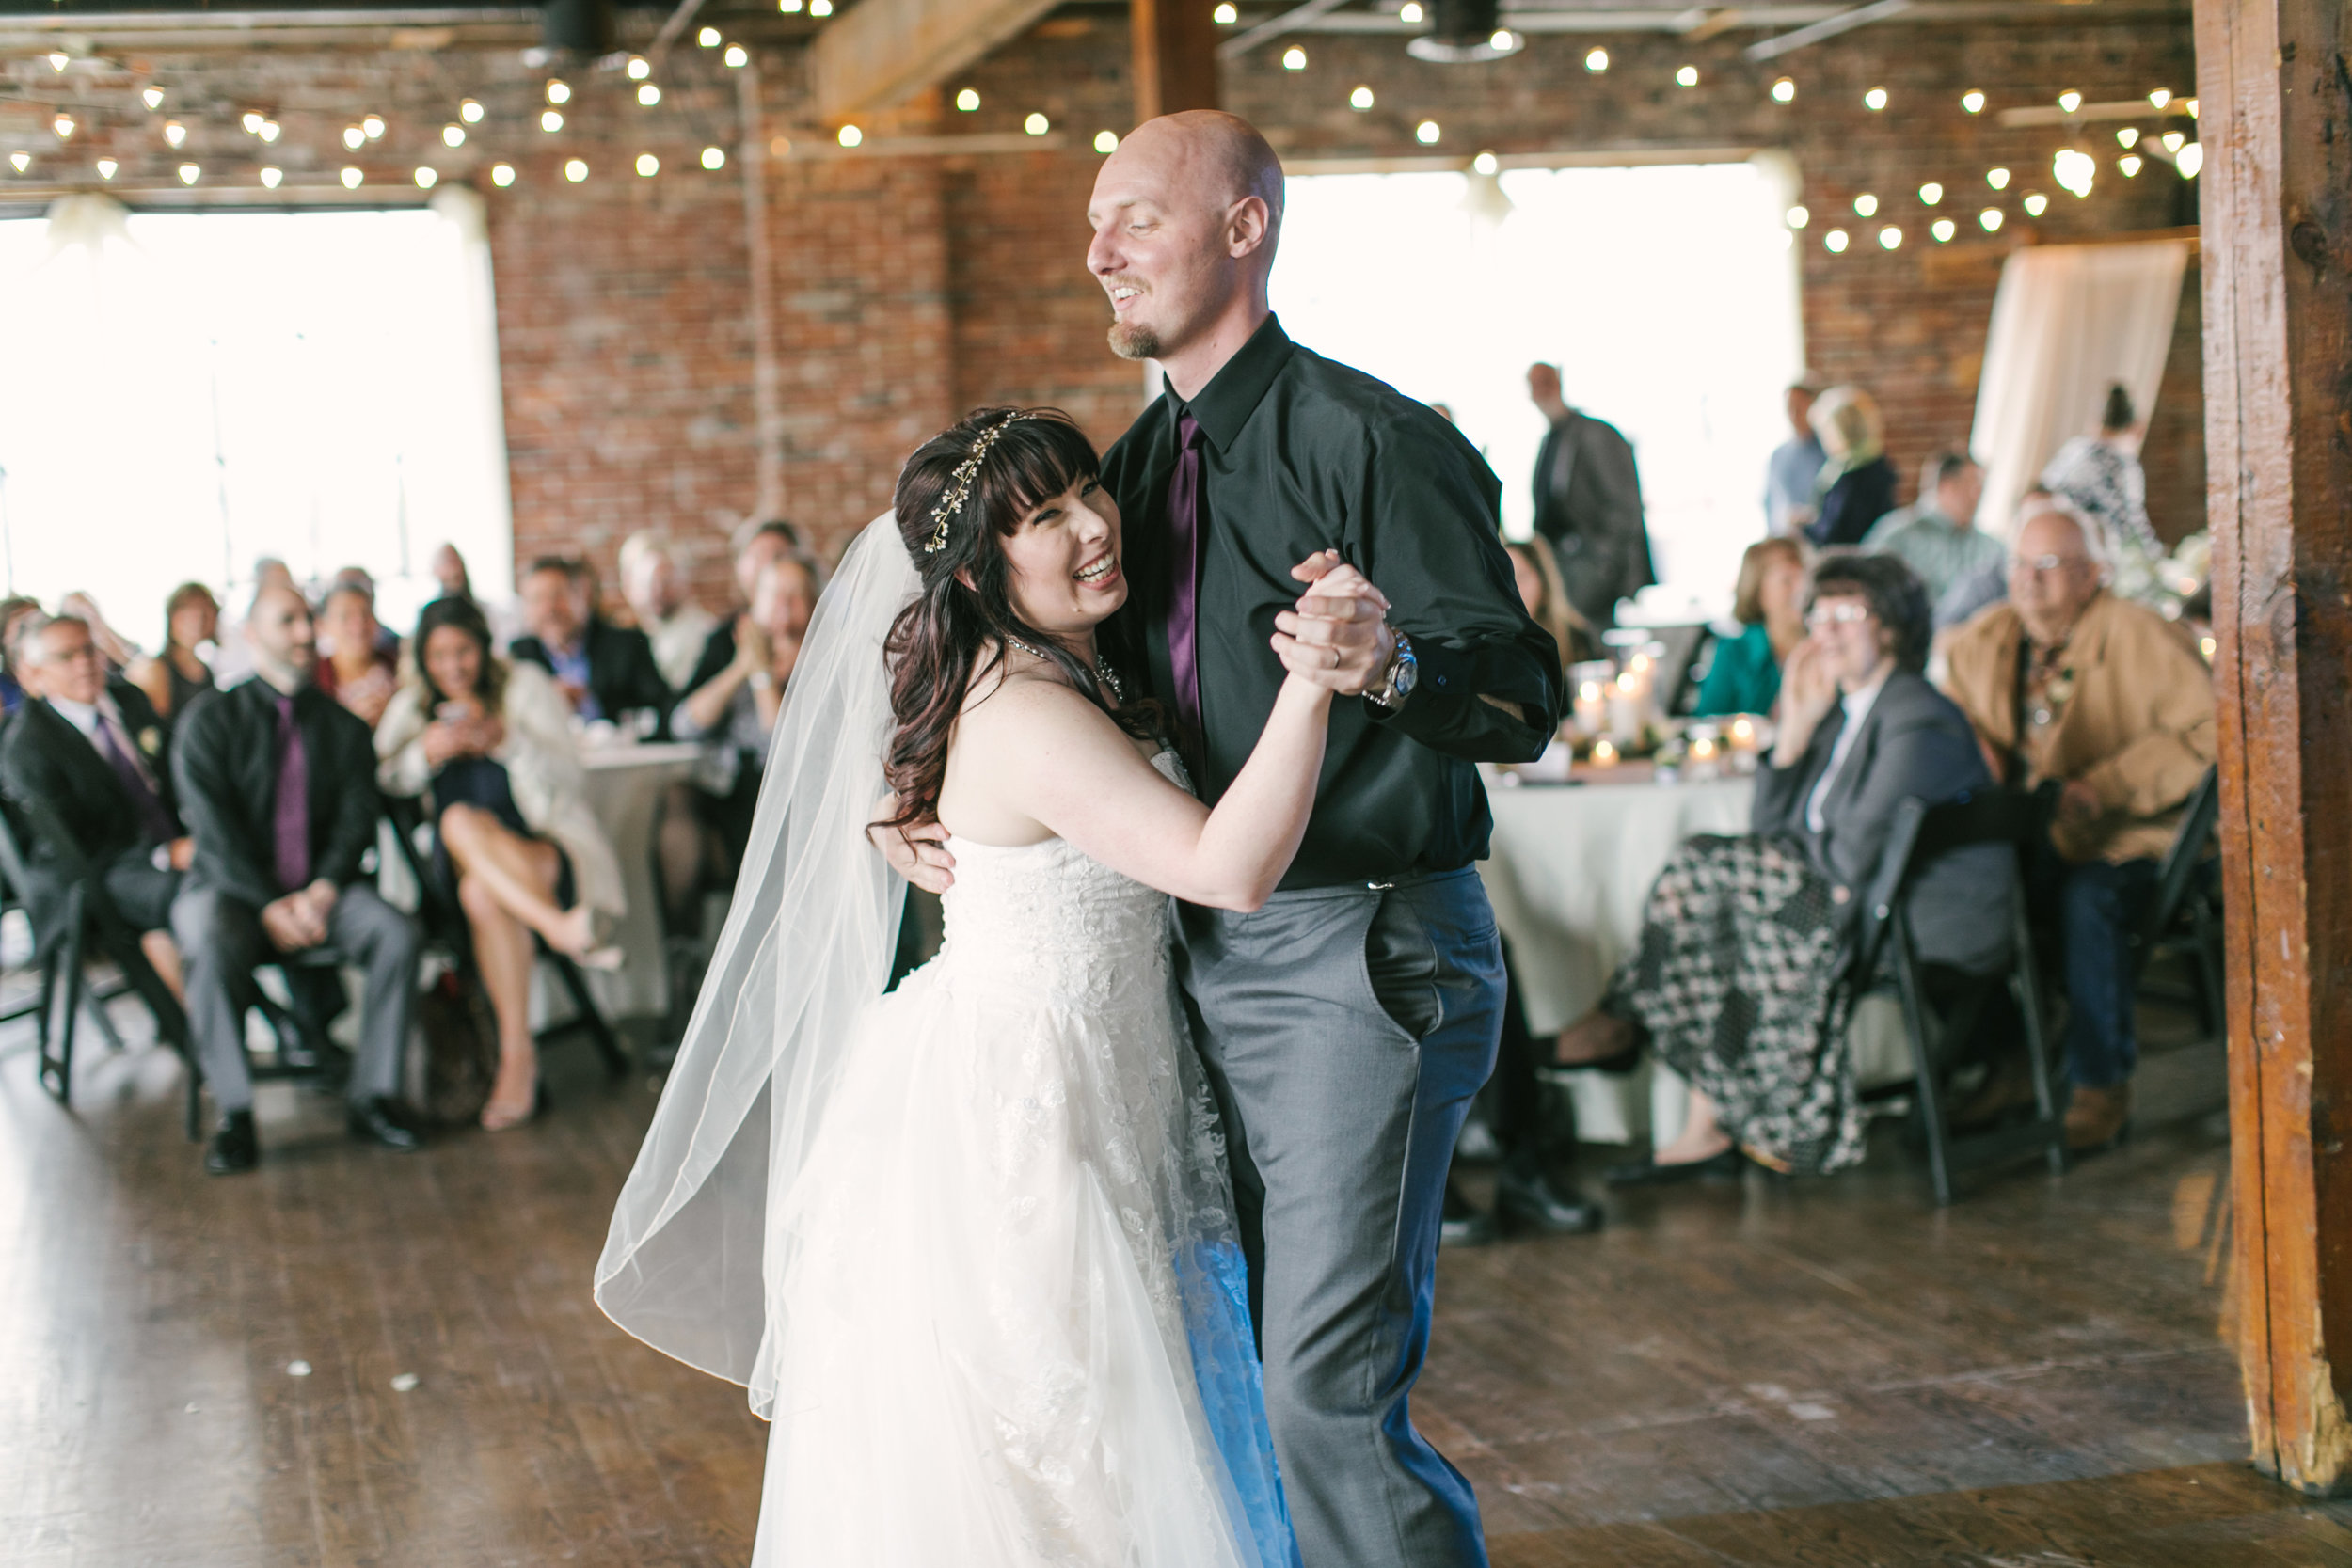 893_Colin+Jessica_Wedding.jpg